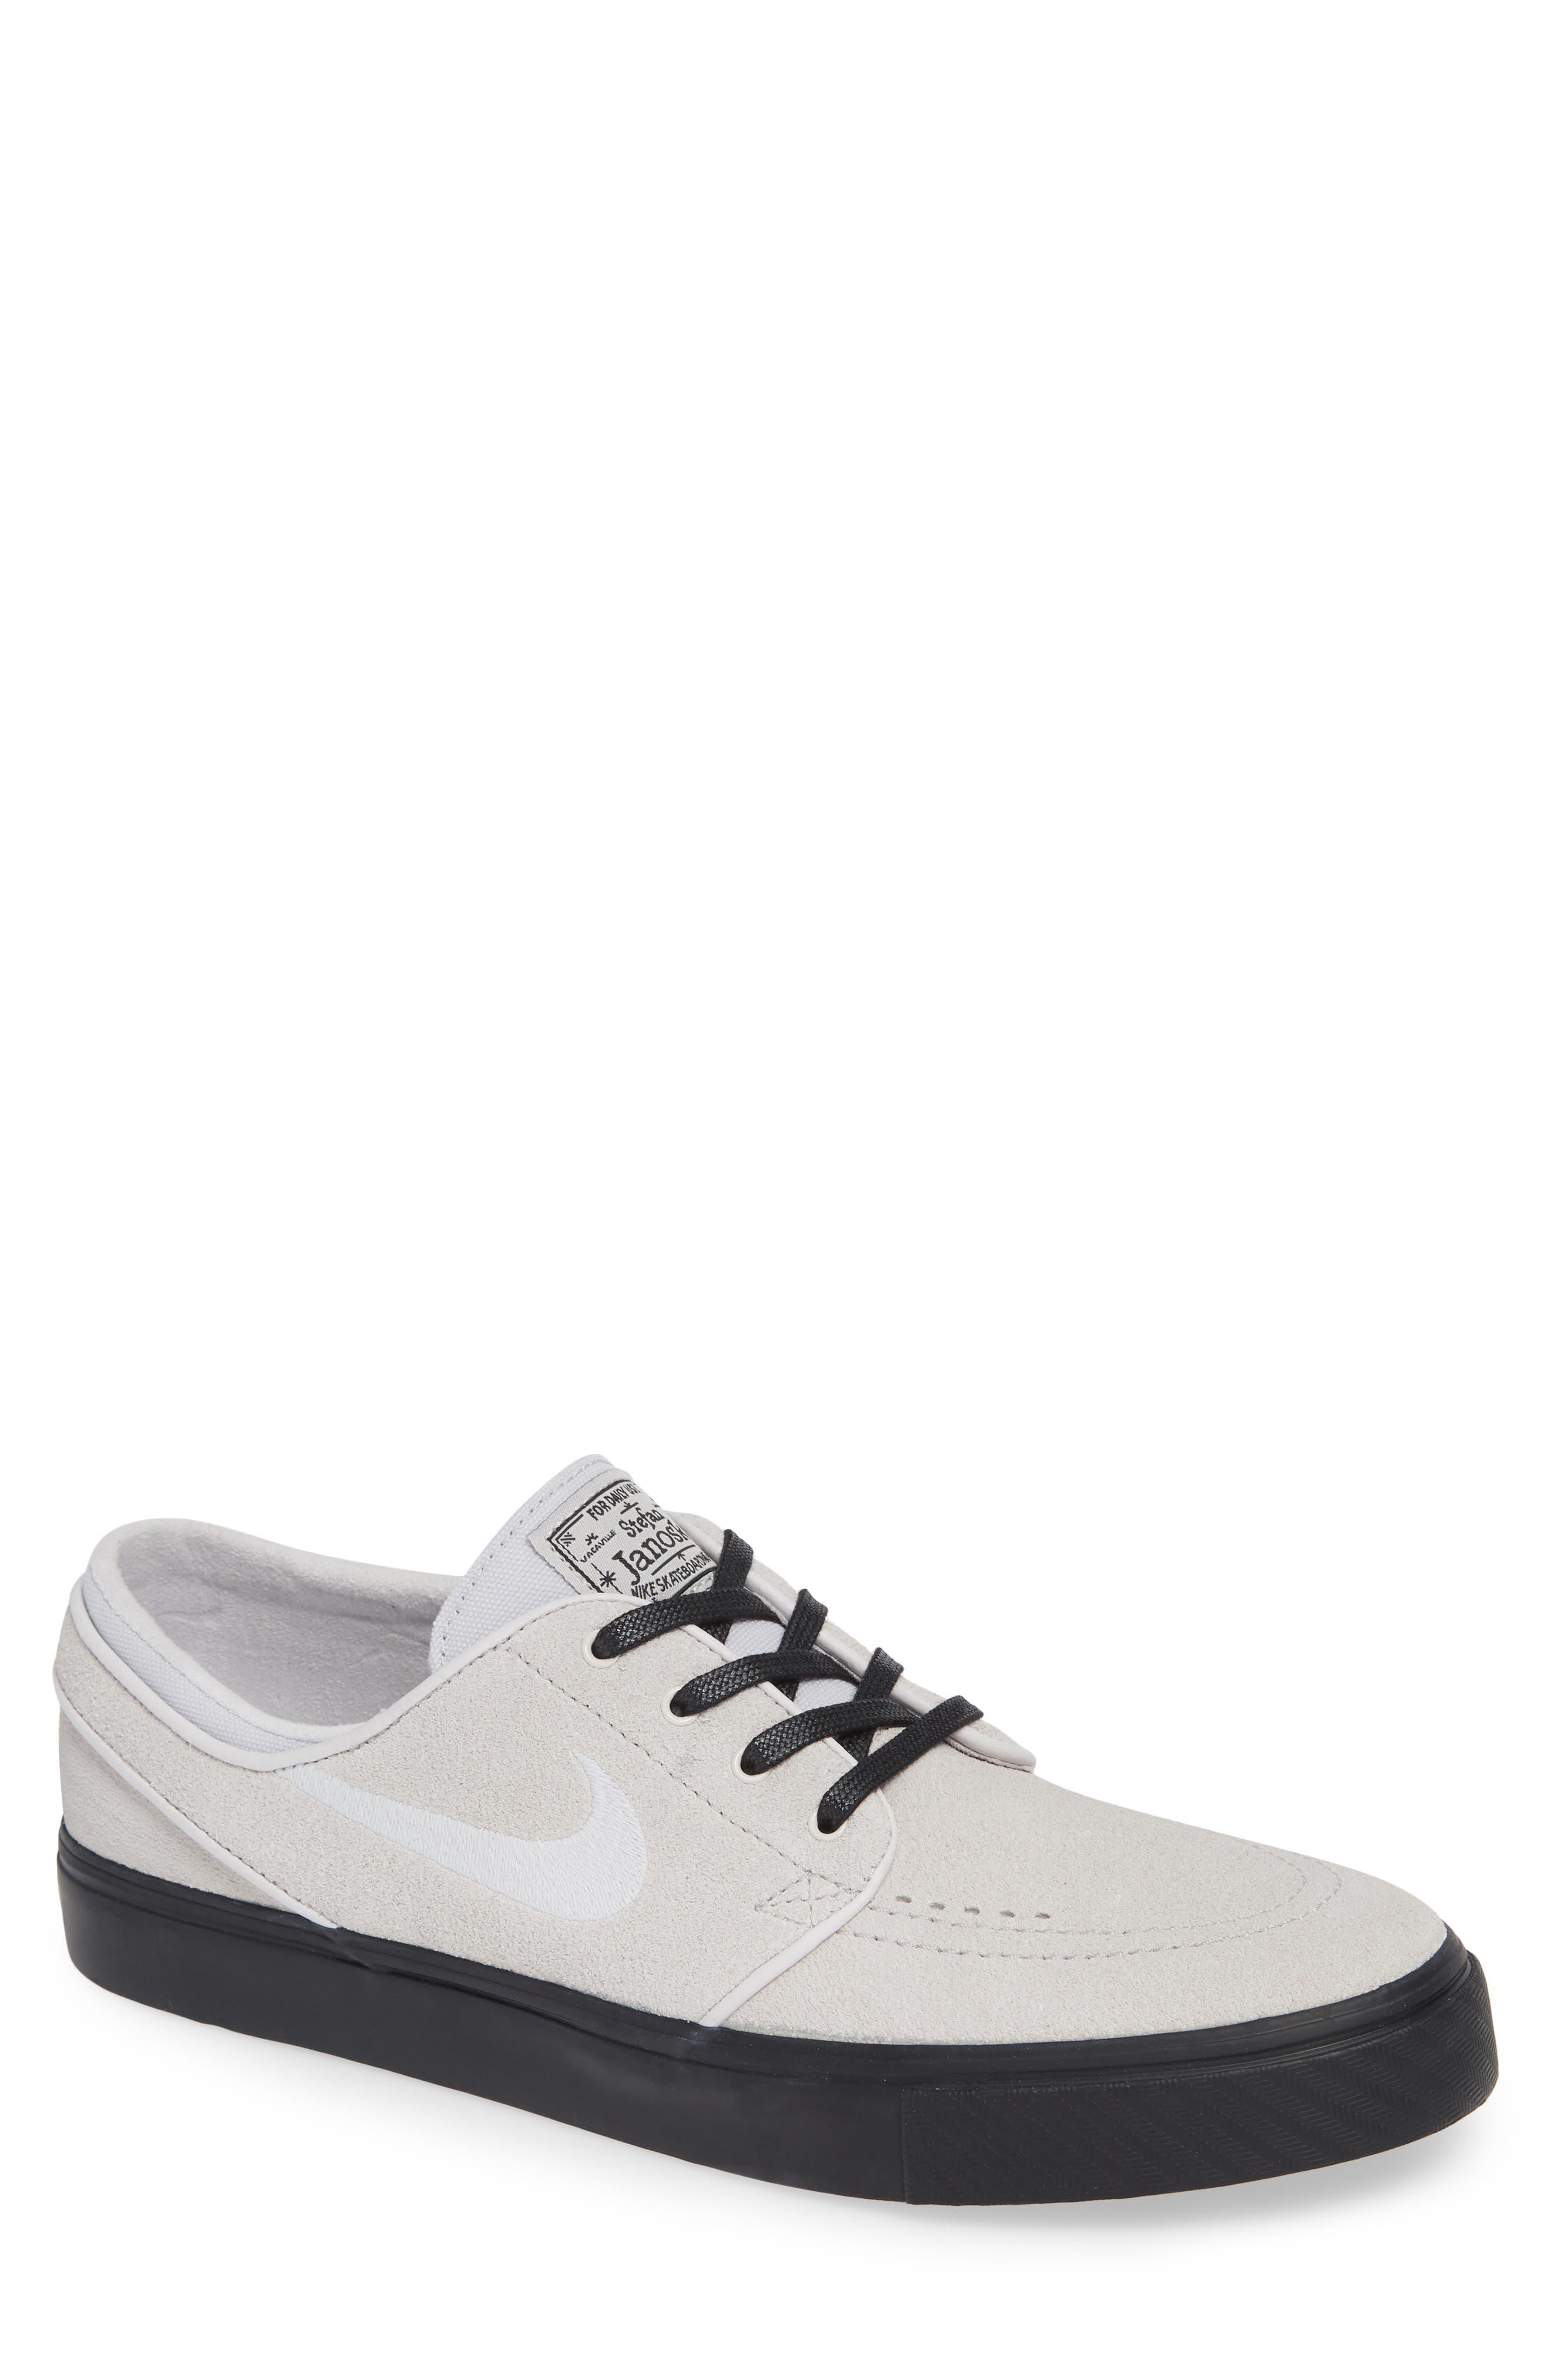 'Zoom - Stefan Janoski' Skate Shoe,                         Main,                         color, 068